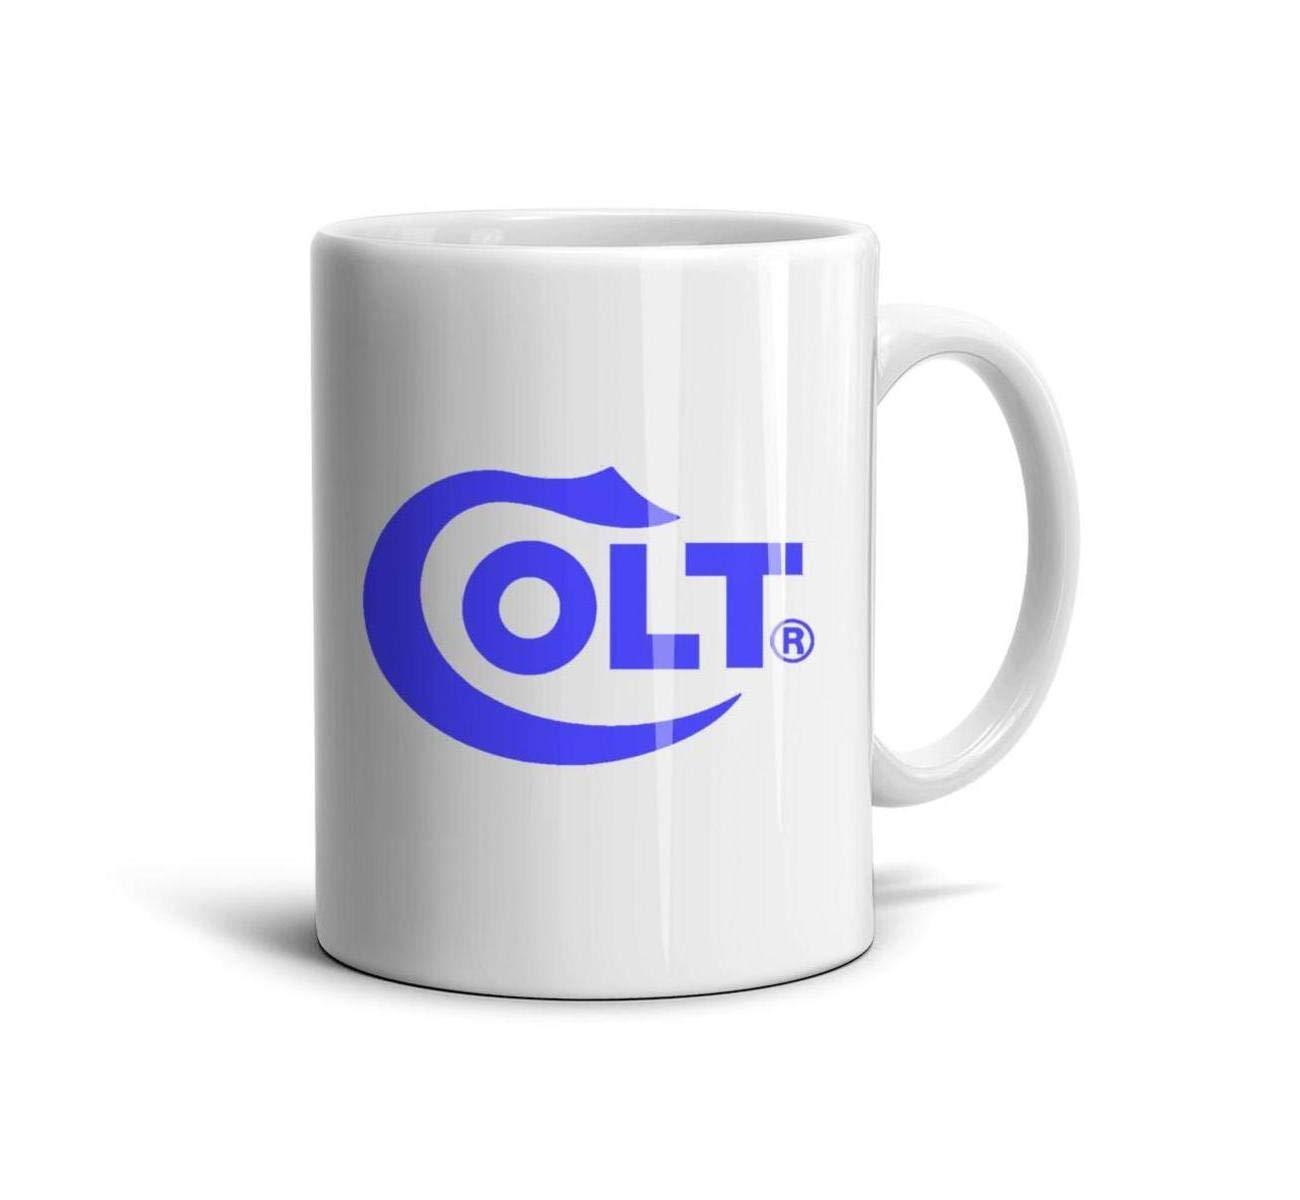 HIYITUTA Colt Logo Mugs White Motivational Mug 11 Oz Couples Mugs FamilyMembers Co-Workers